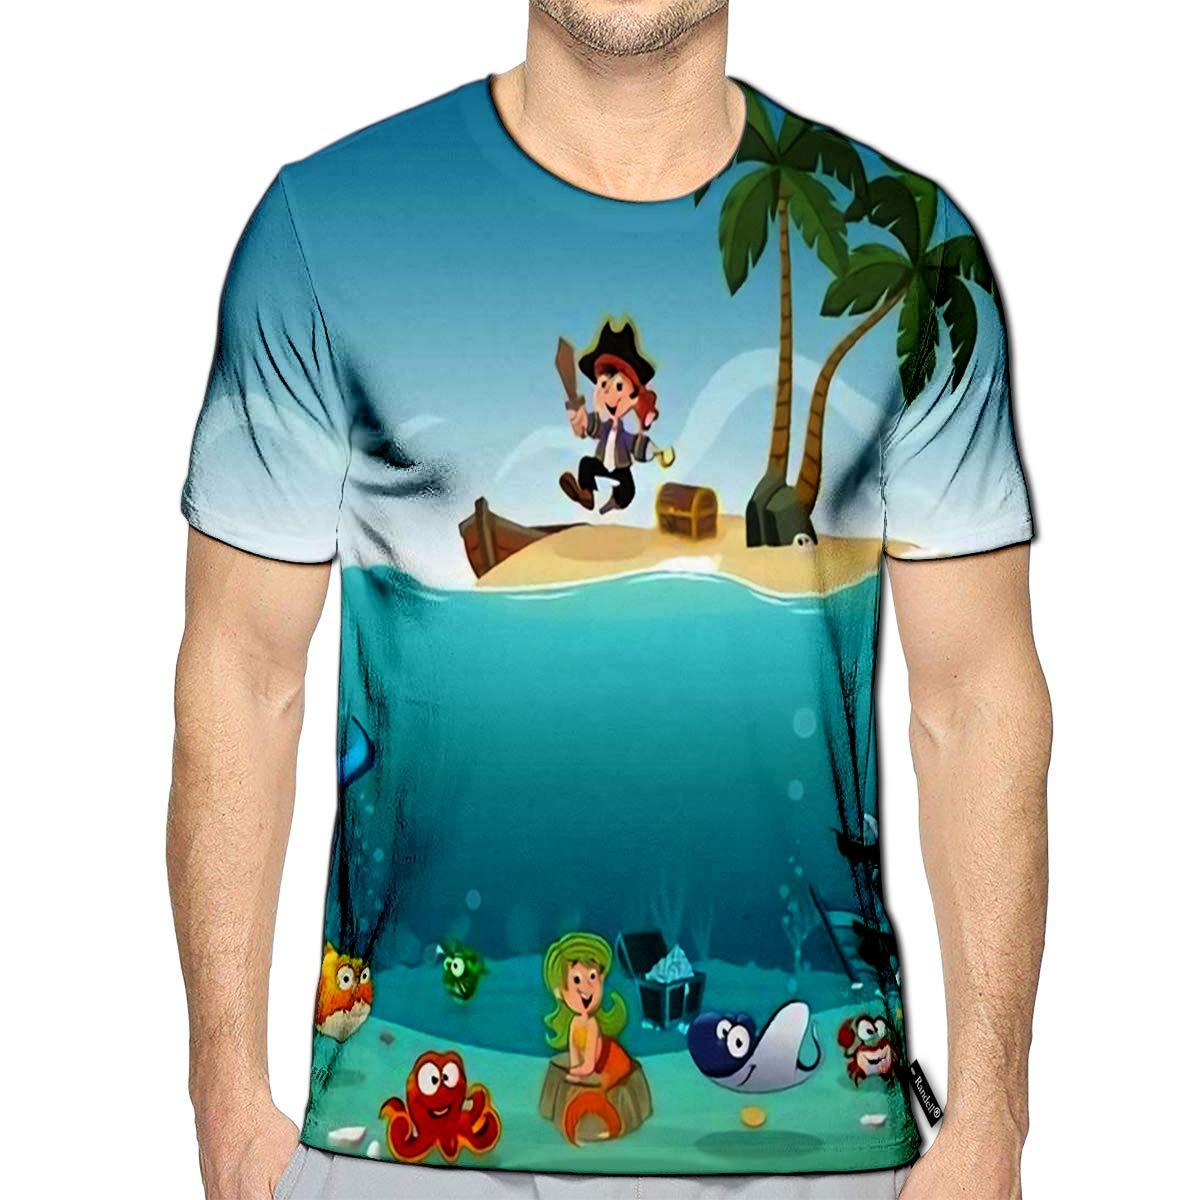 Randell 3D Printed T-Shirts Slogan Faraway Fashion Short Sleeve Tops Tees